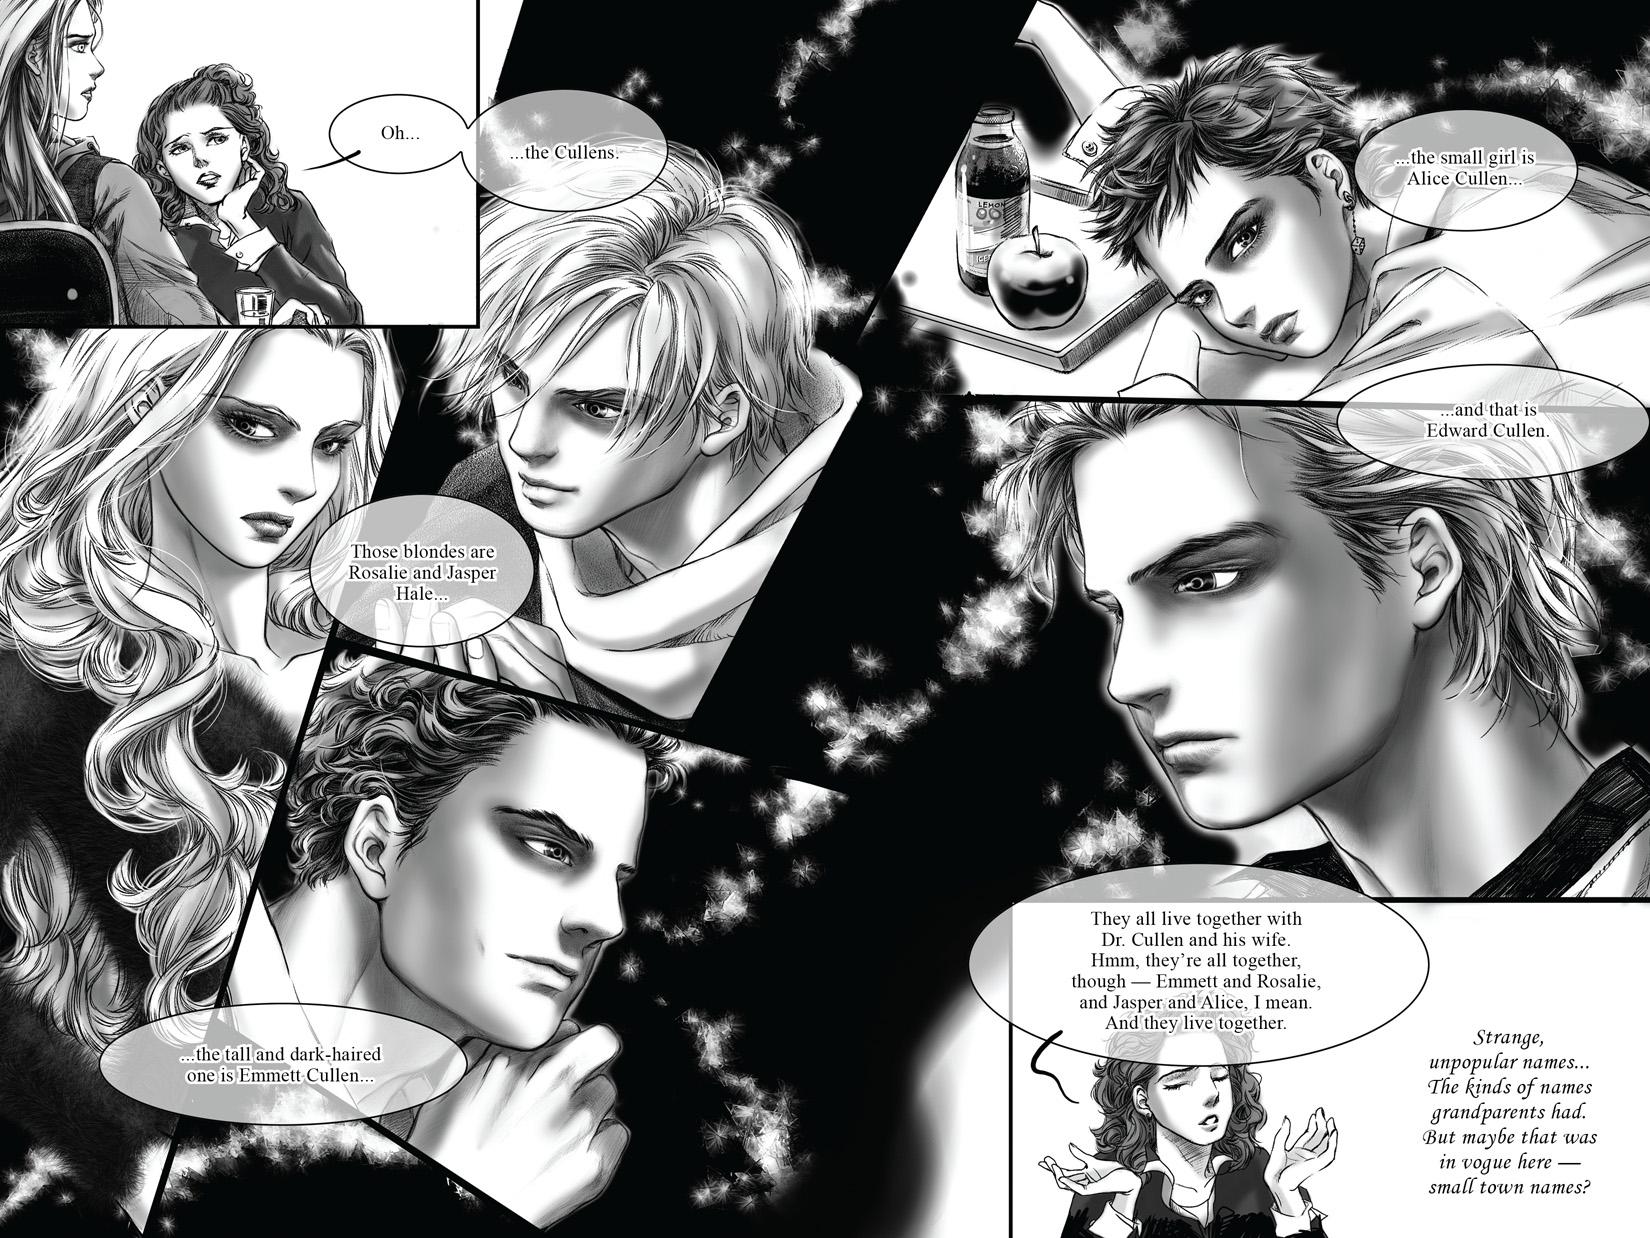 Amazon.com: Twilight: The Graphic Novel, Vol. 1 (The